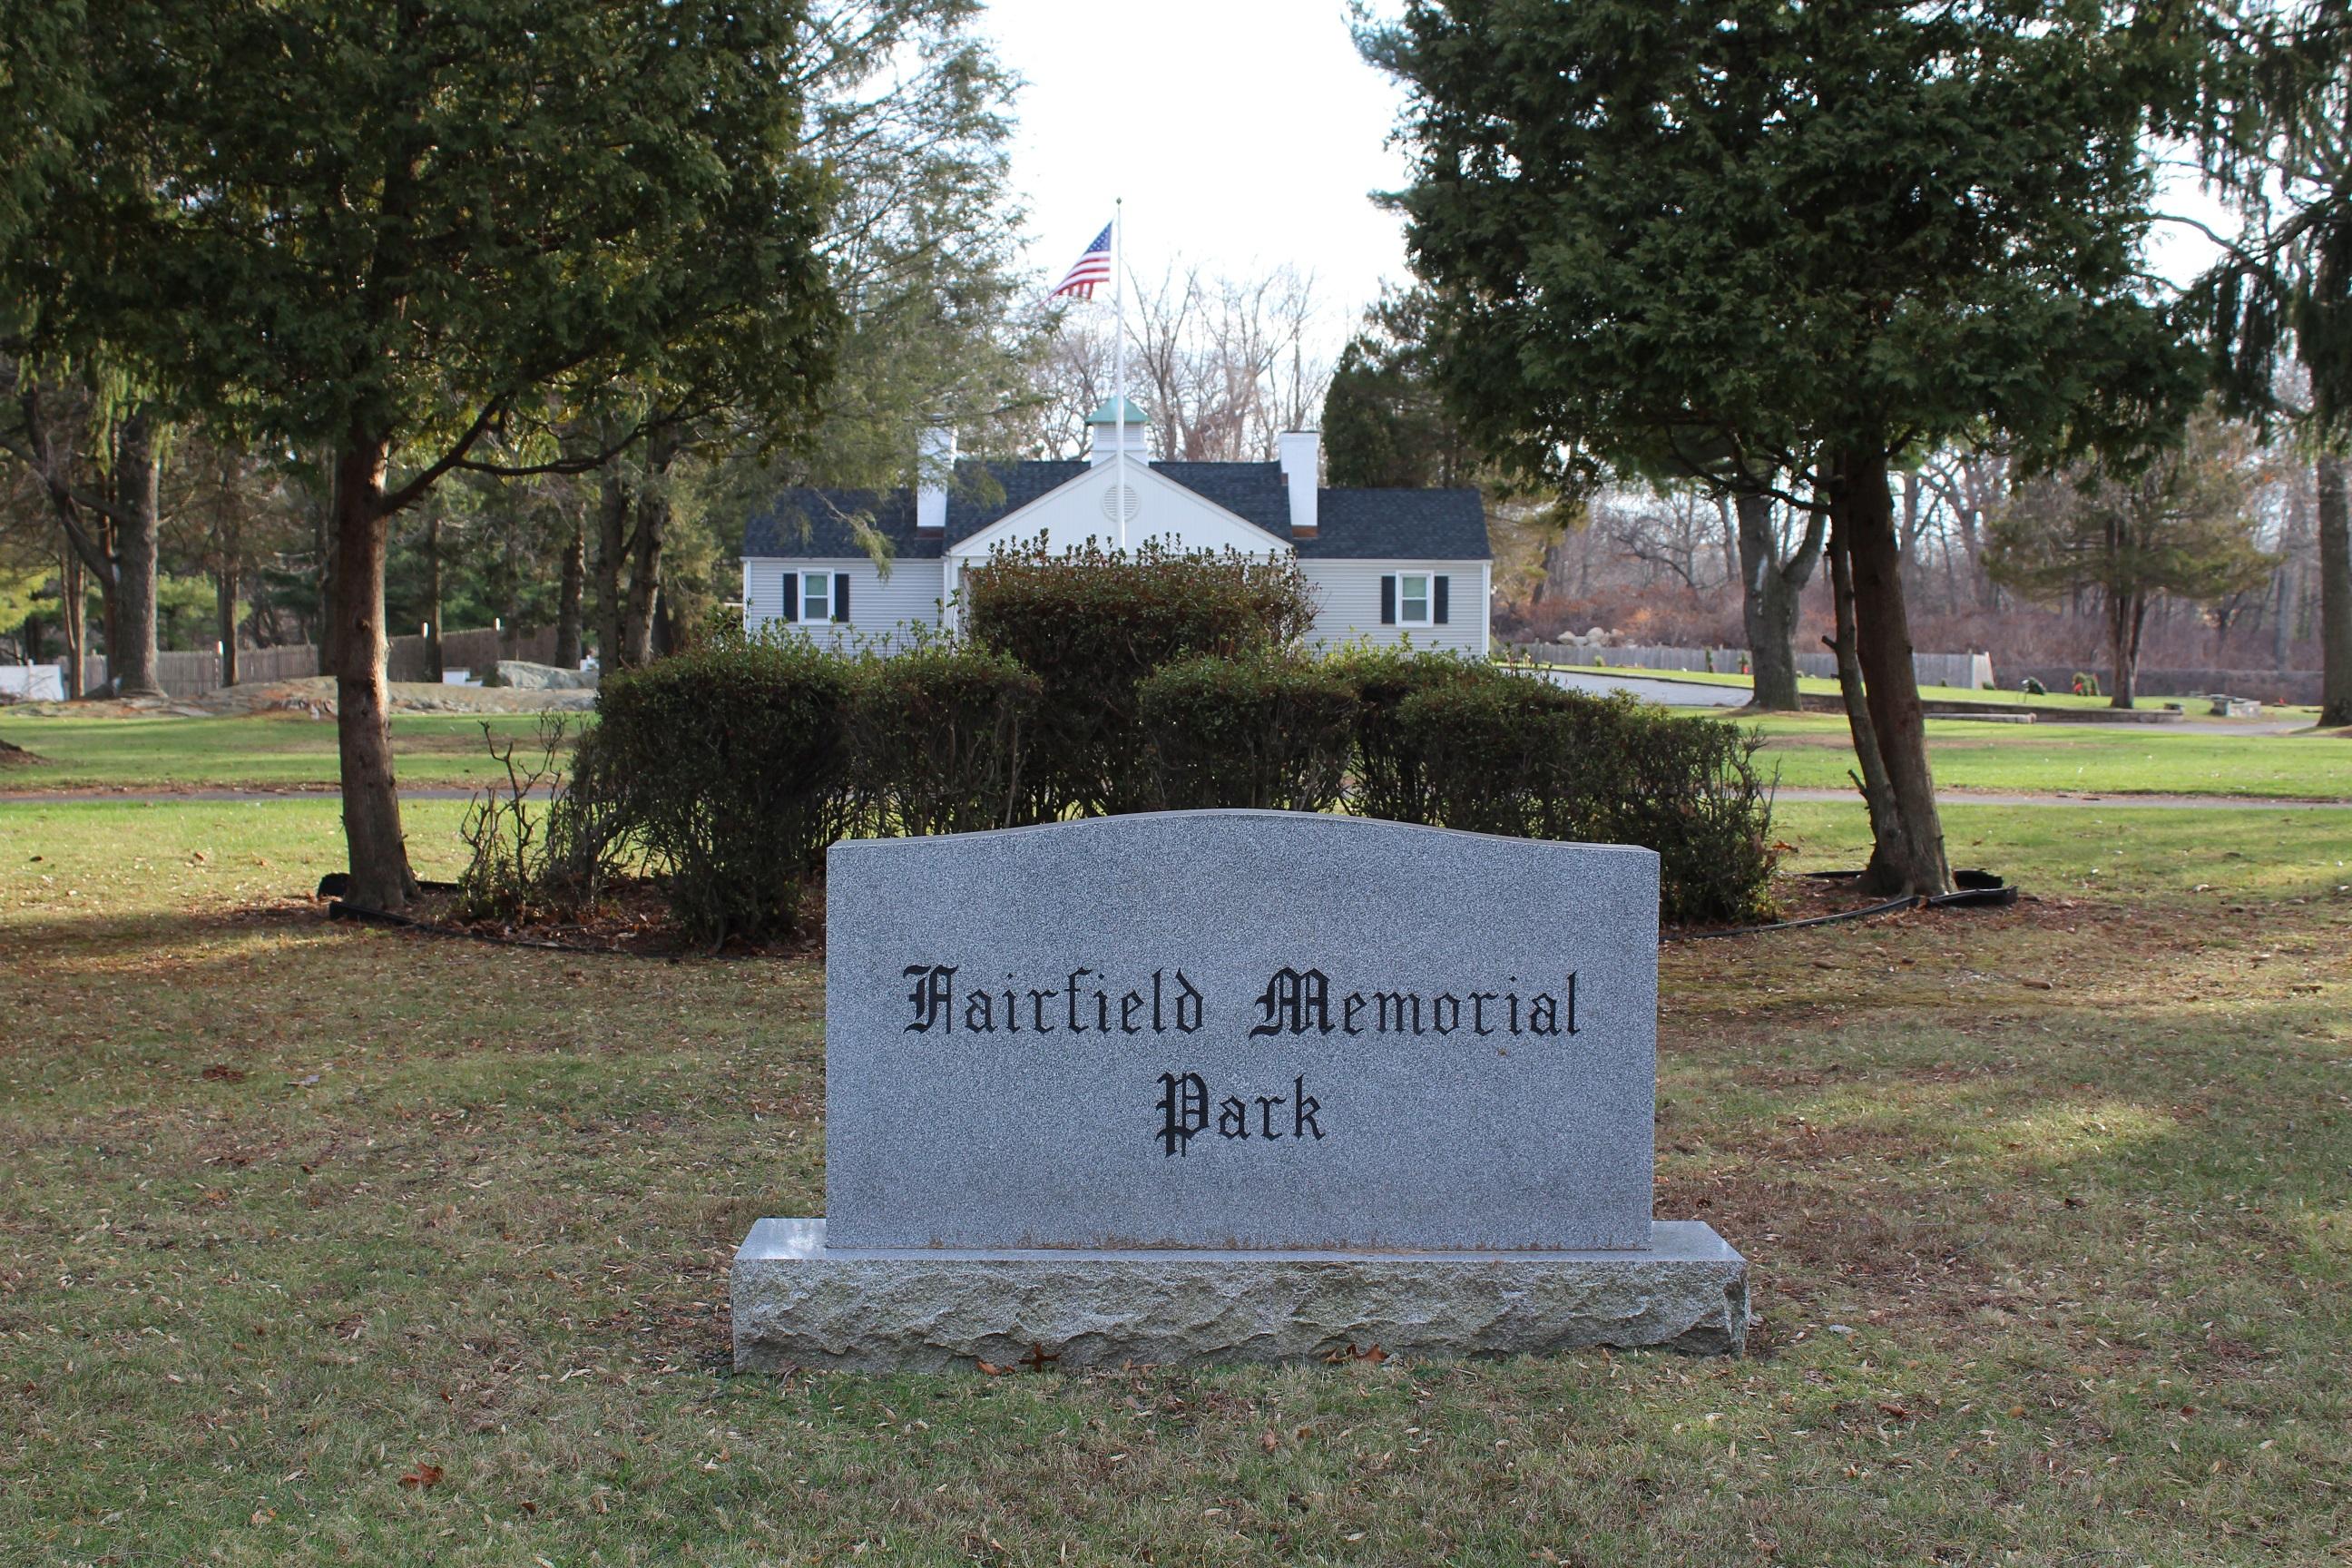 Fairfield Memorial Park